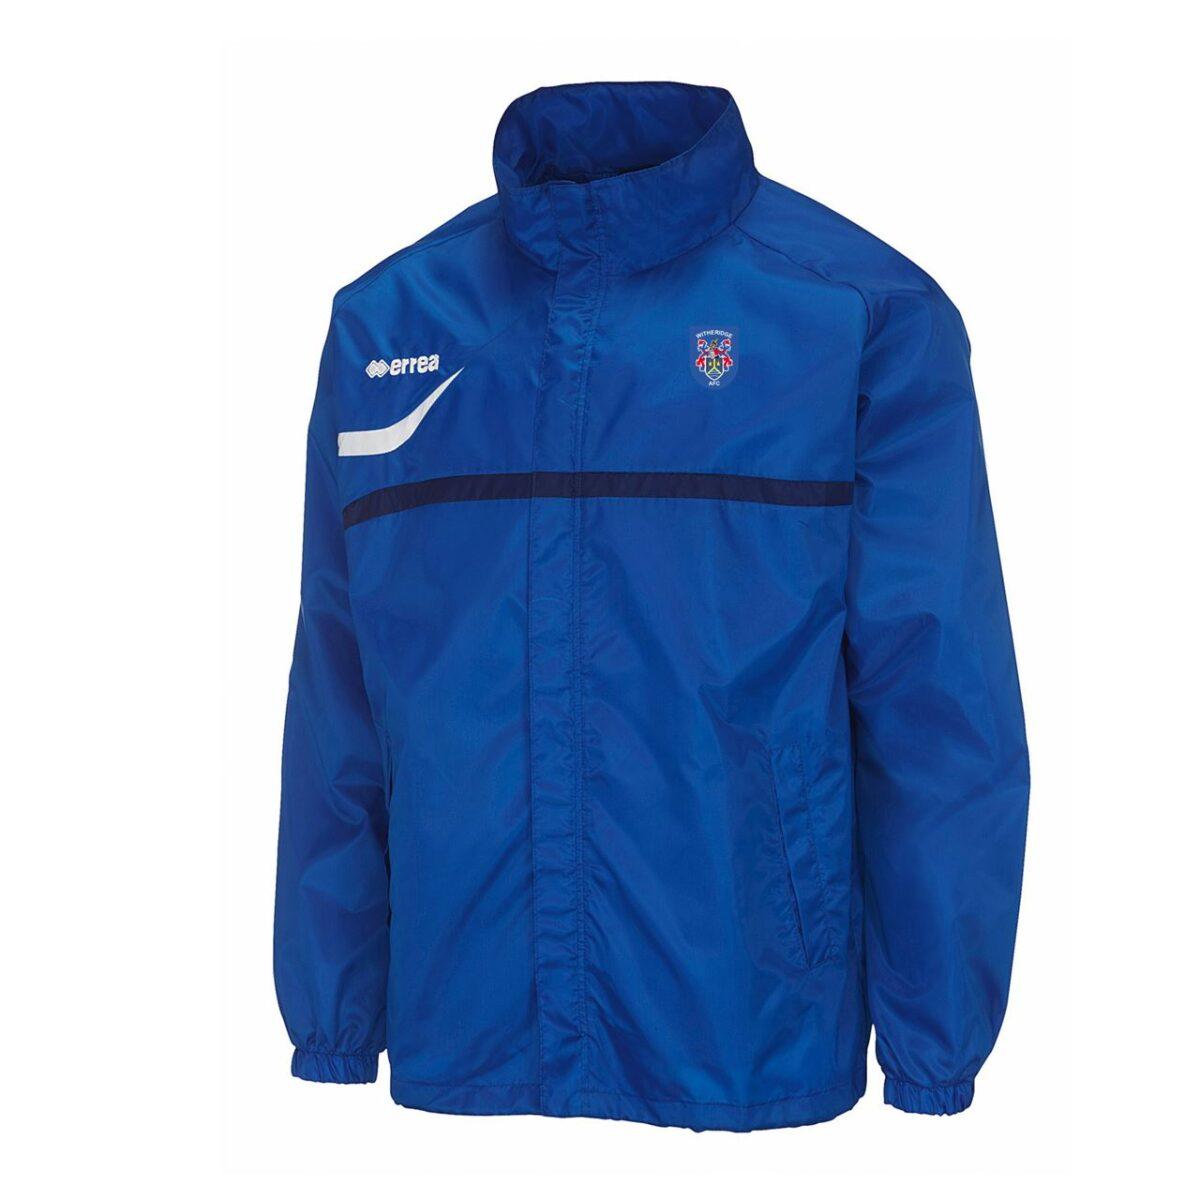 Witheridge Football Club Rain Jacket - Royal